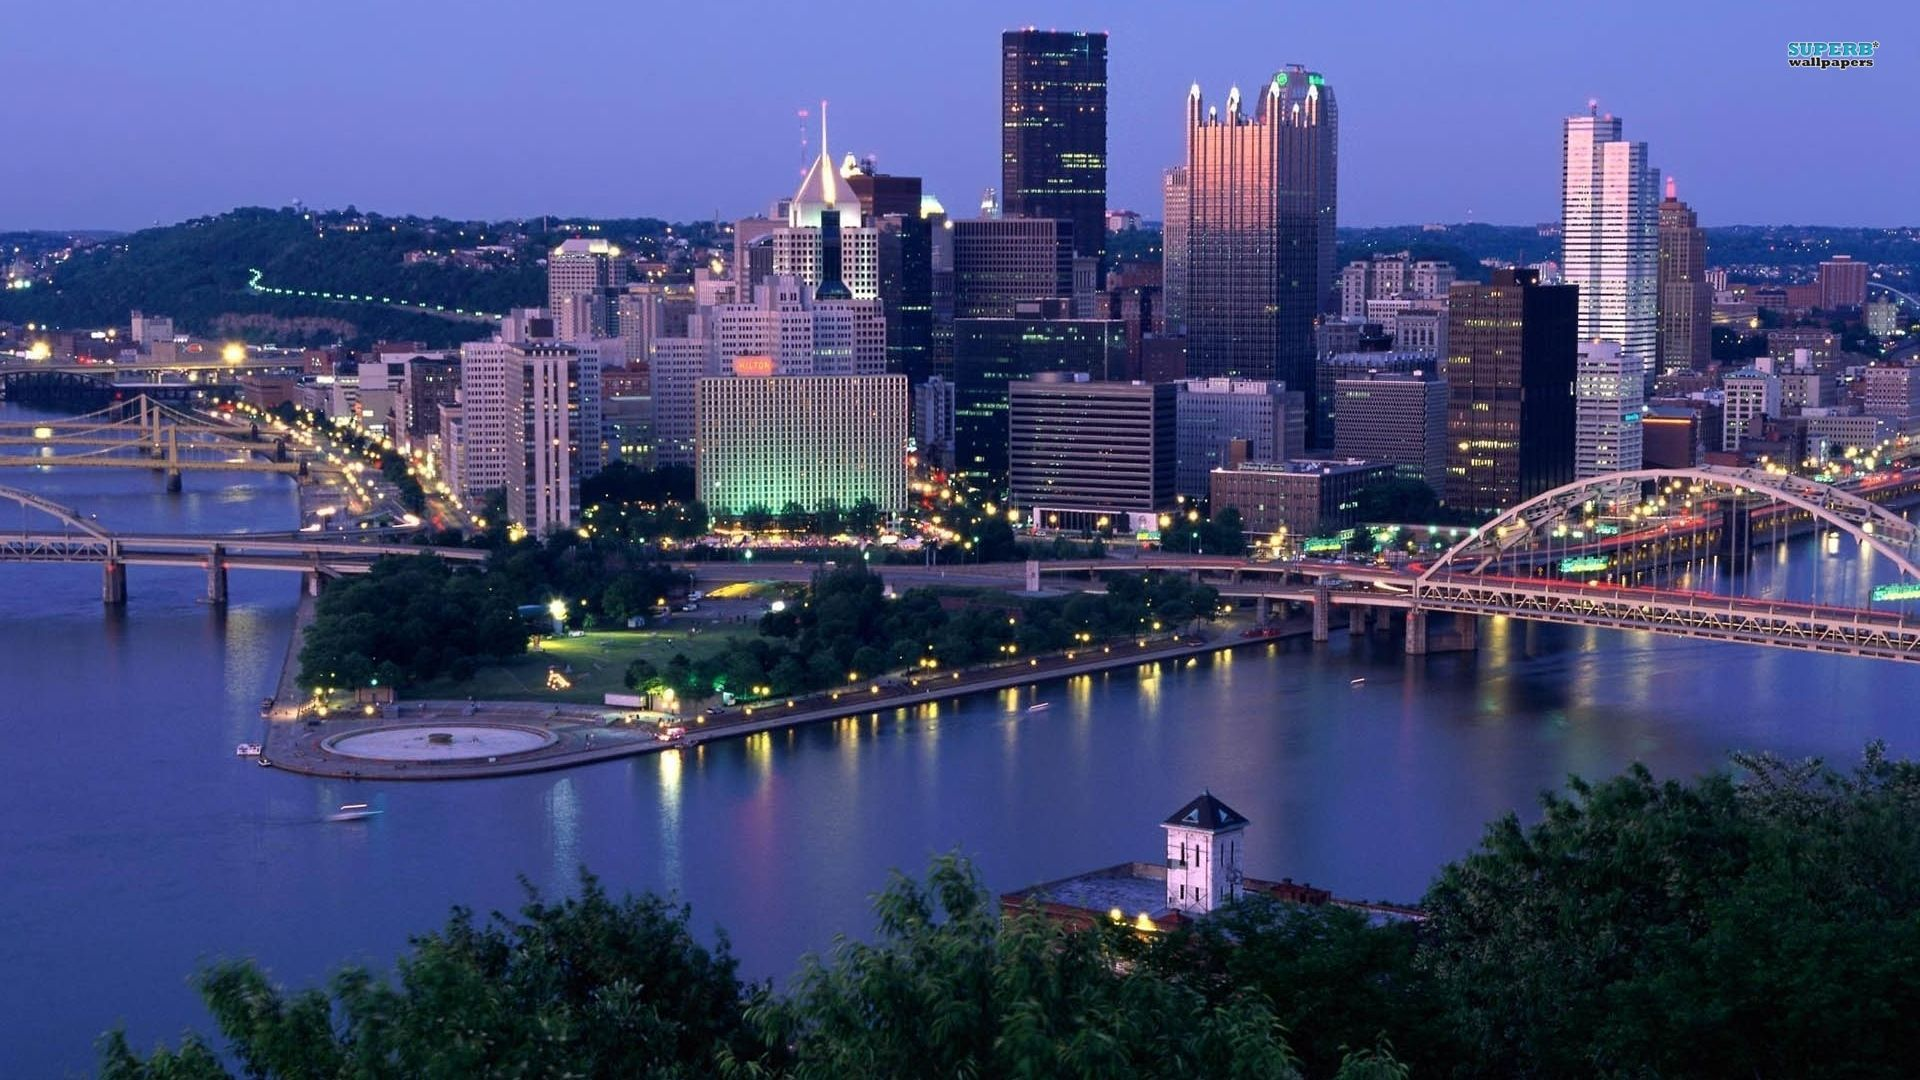 Philadelphia hd picture